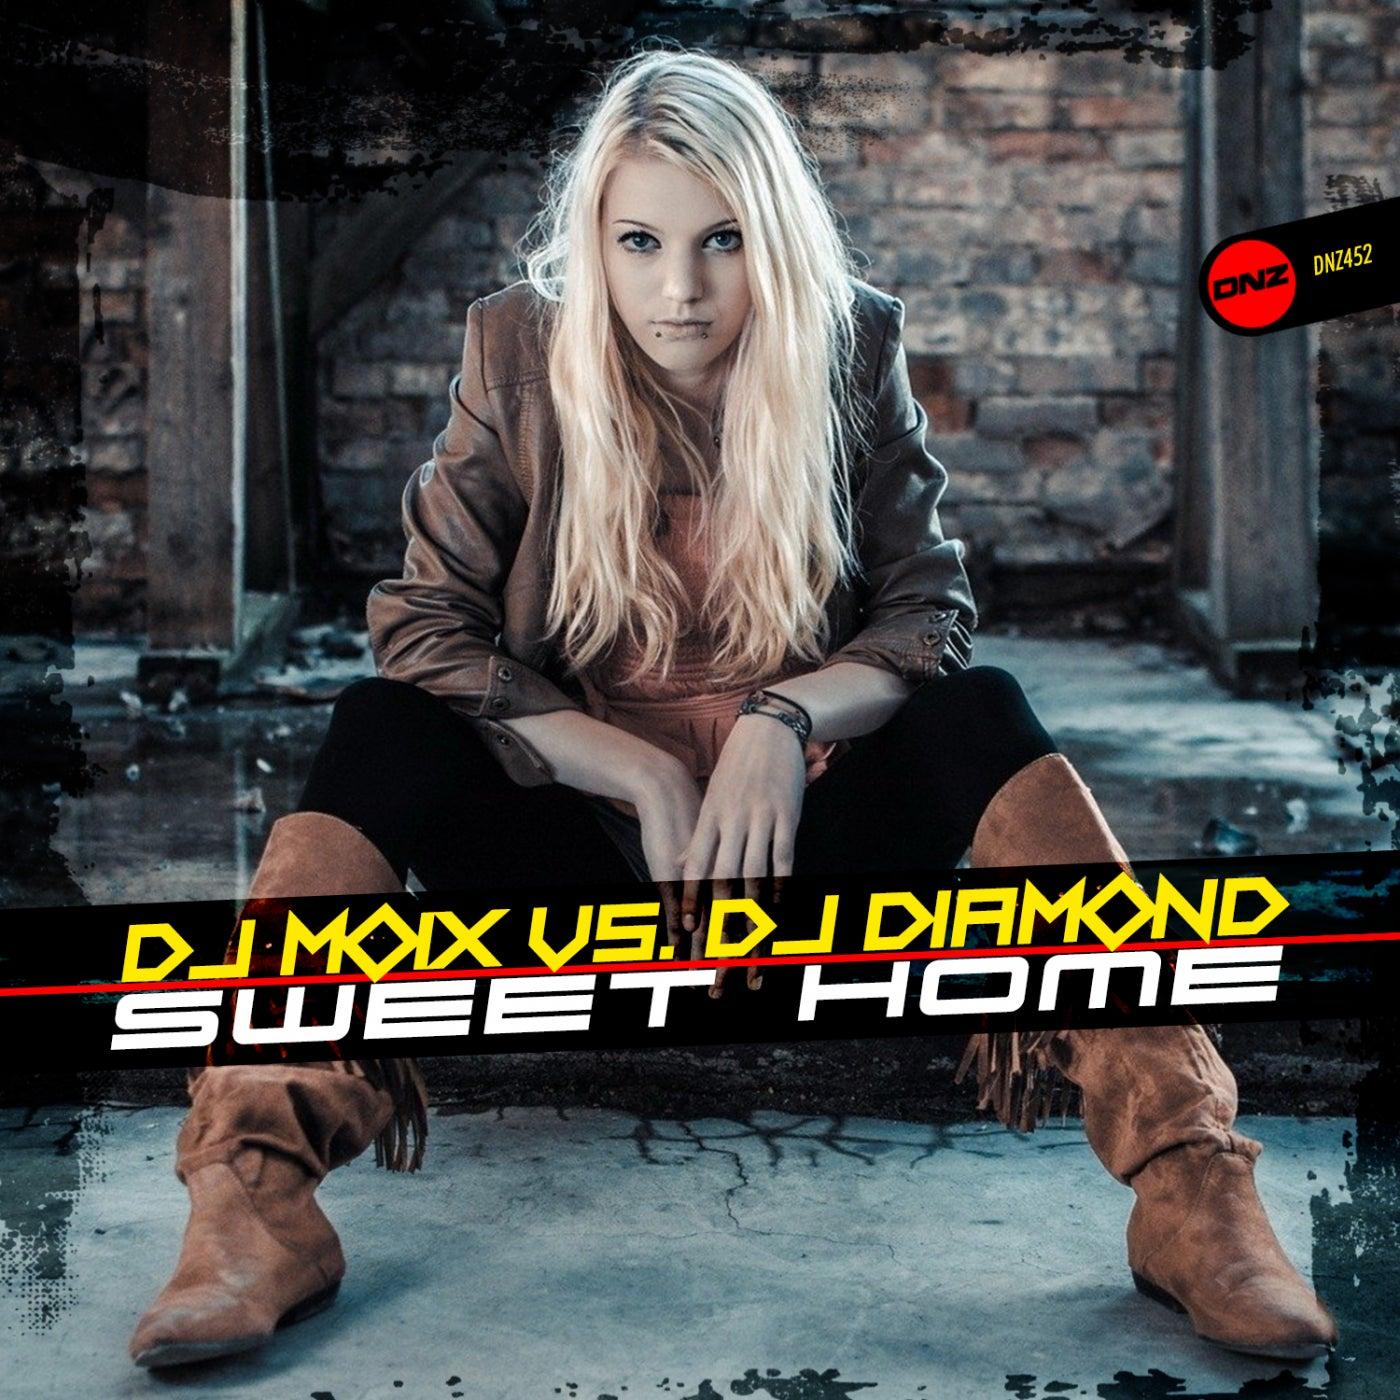 Sweet Home (Original Mix)